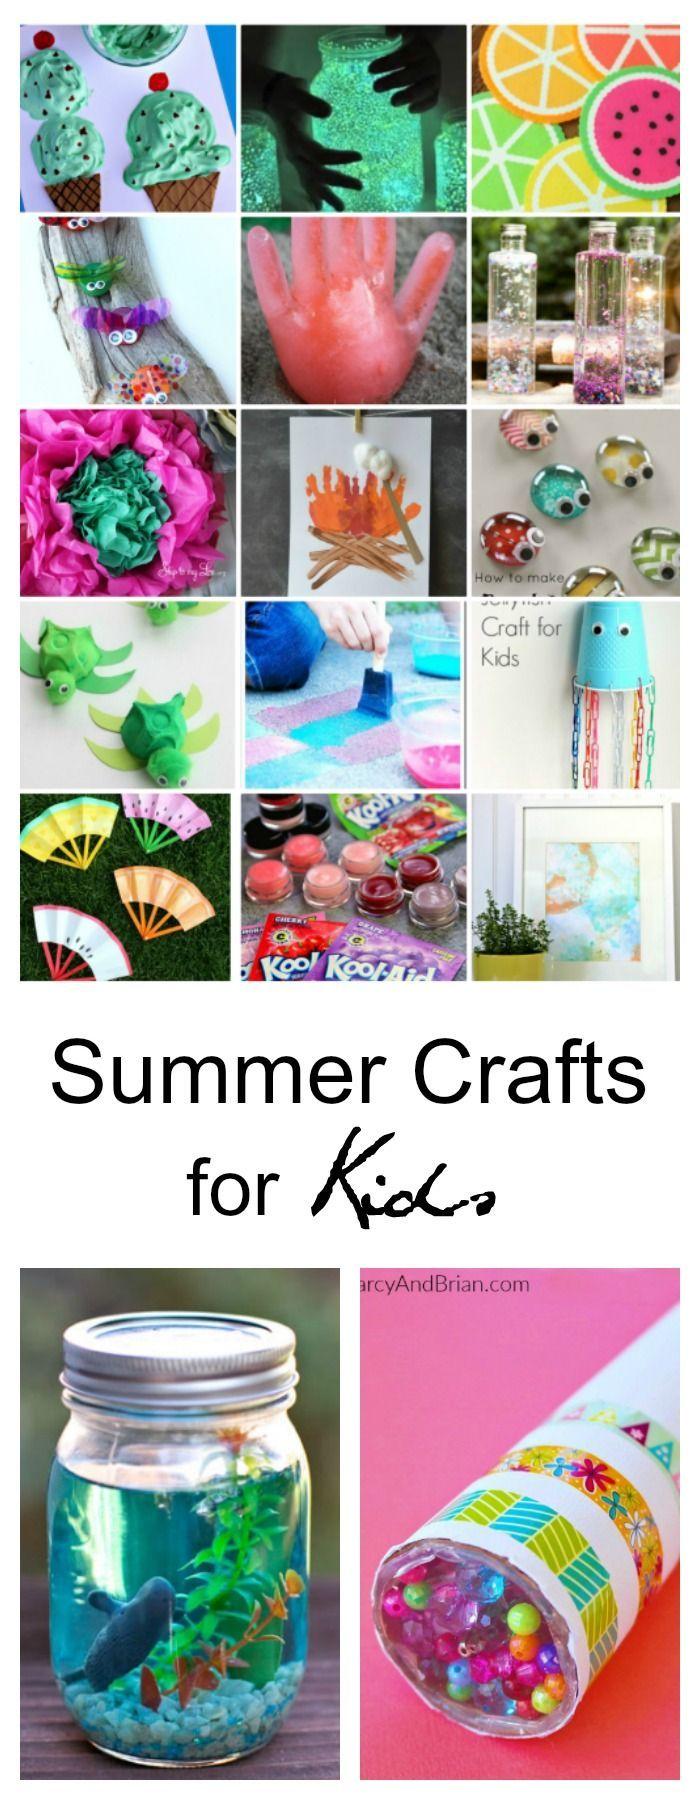 Summer Ideas| Summer Craft Ideas for Kids - The Idea Room